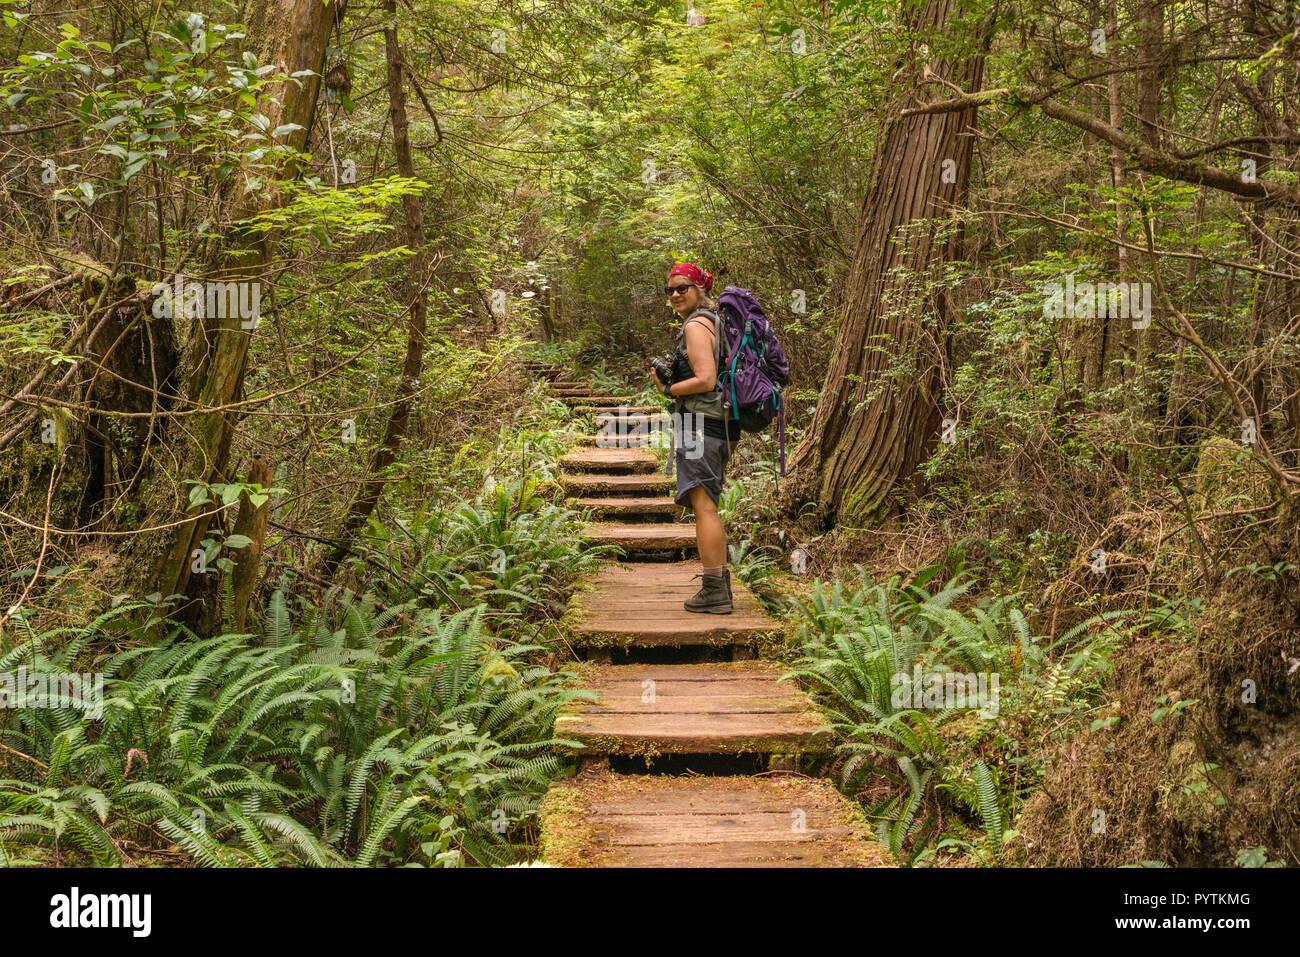 Middle age woman hiking, Cape Alava Trail, temperate rain forest, near Cape Alava, Pacific Coast, Olympic National Park, Washington state, USA - Stock Image